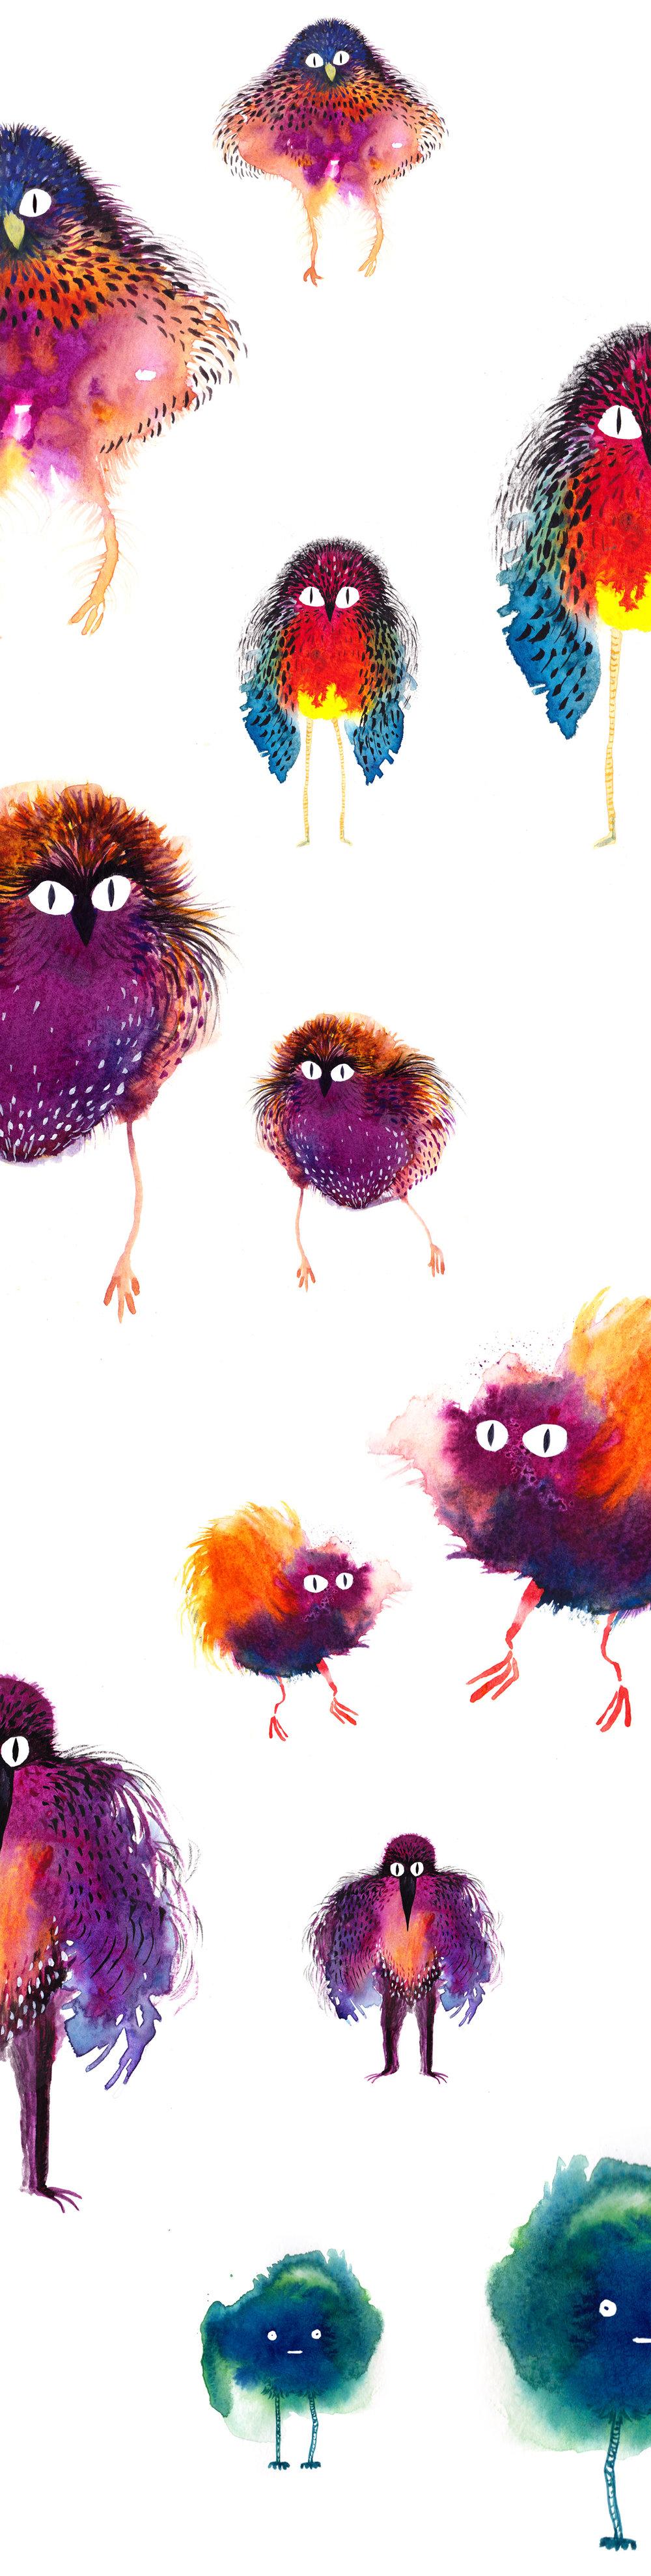 Laetitia_Eaton_watercolor_birds